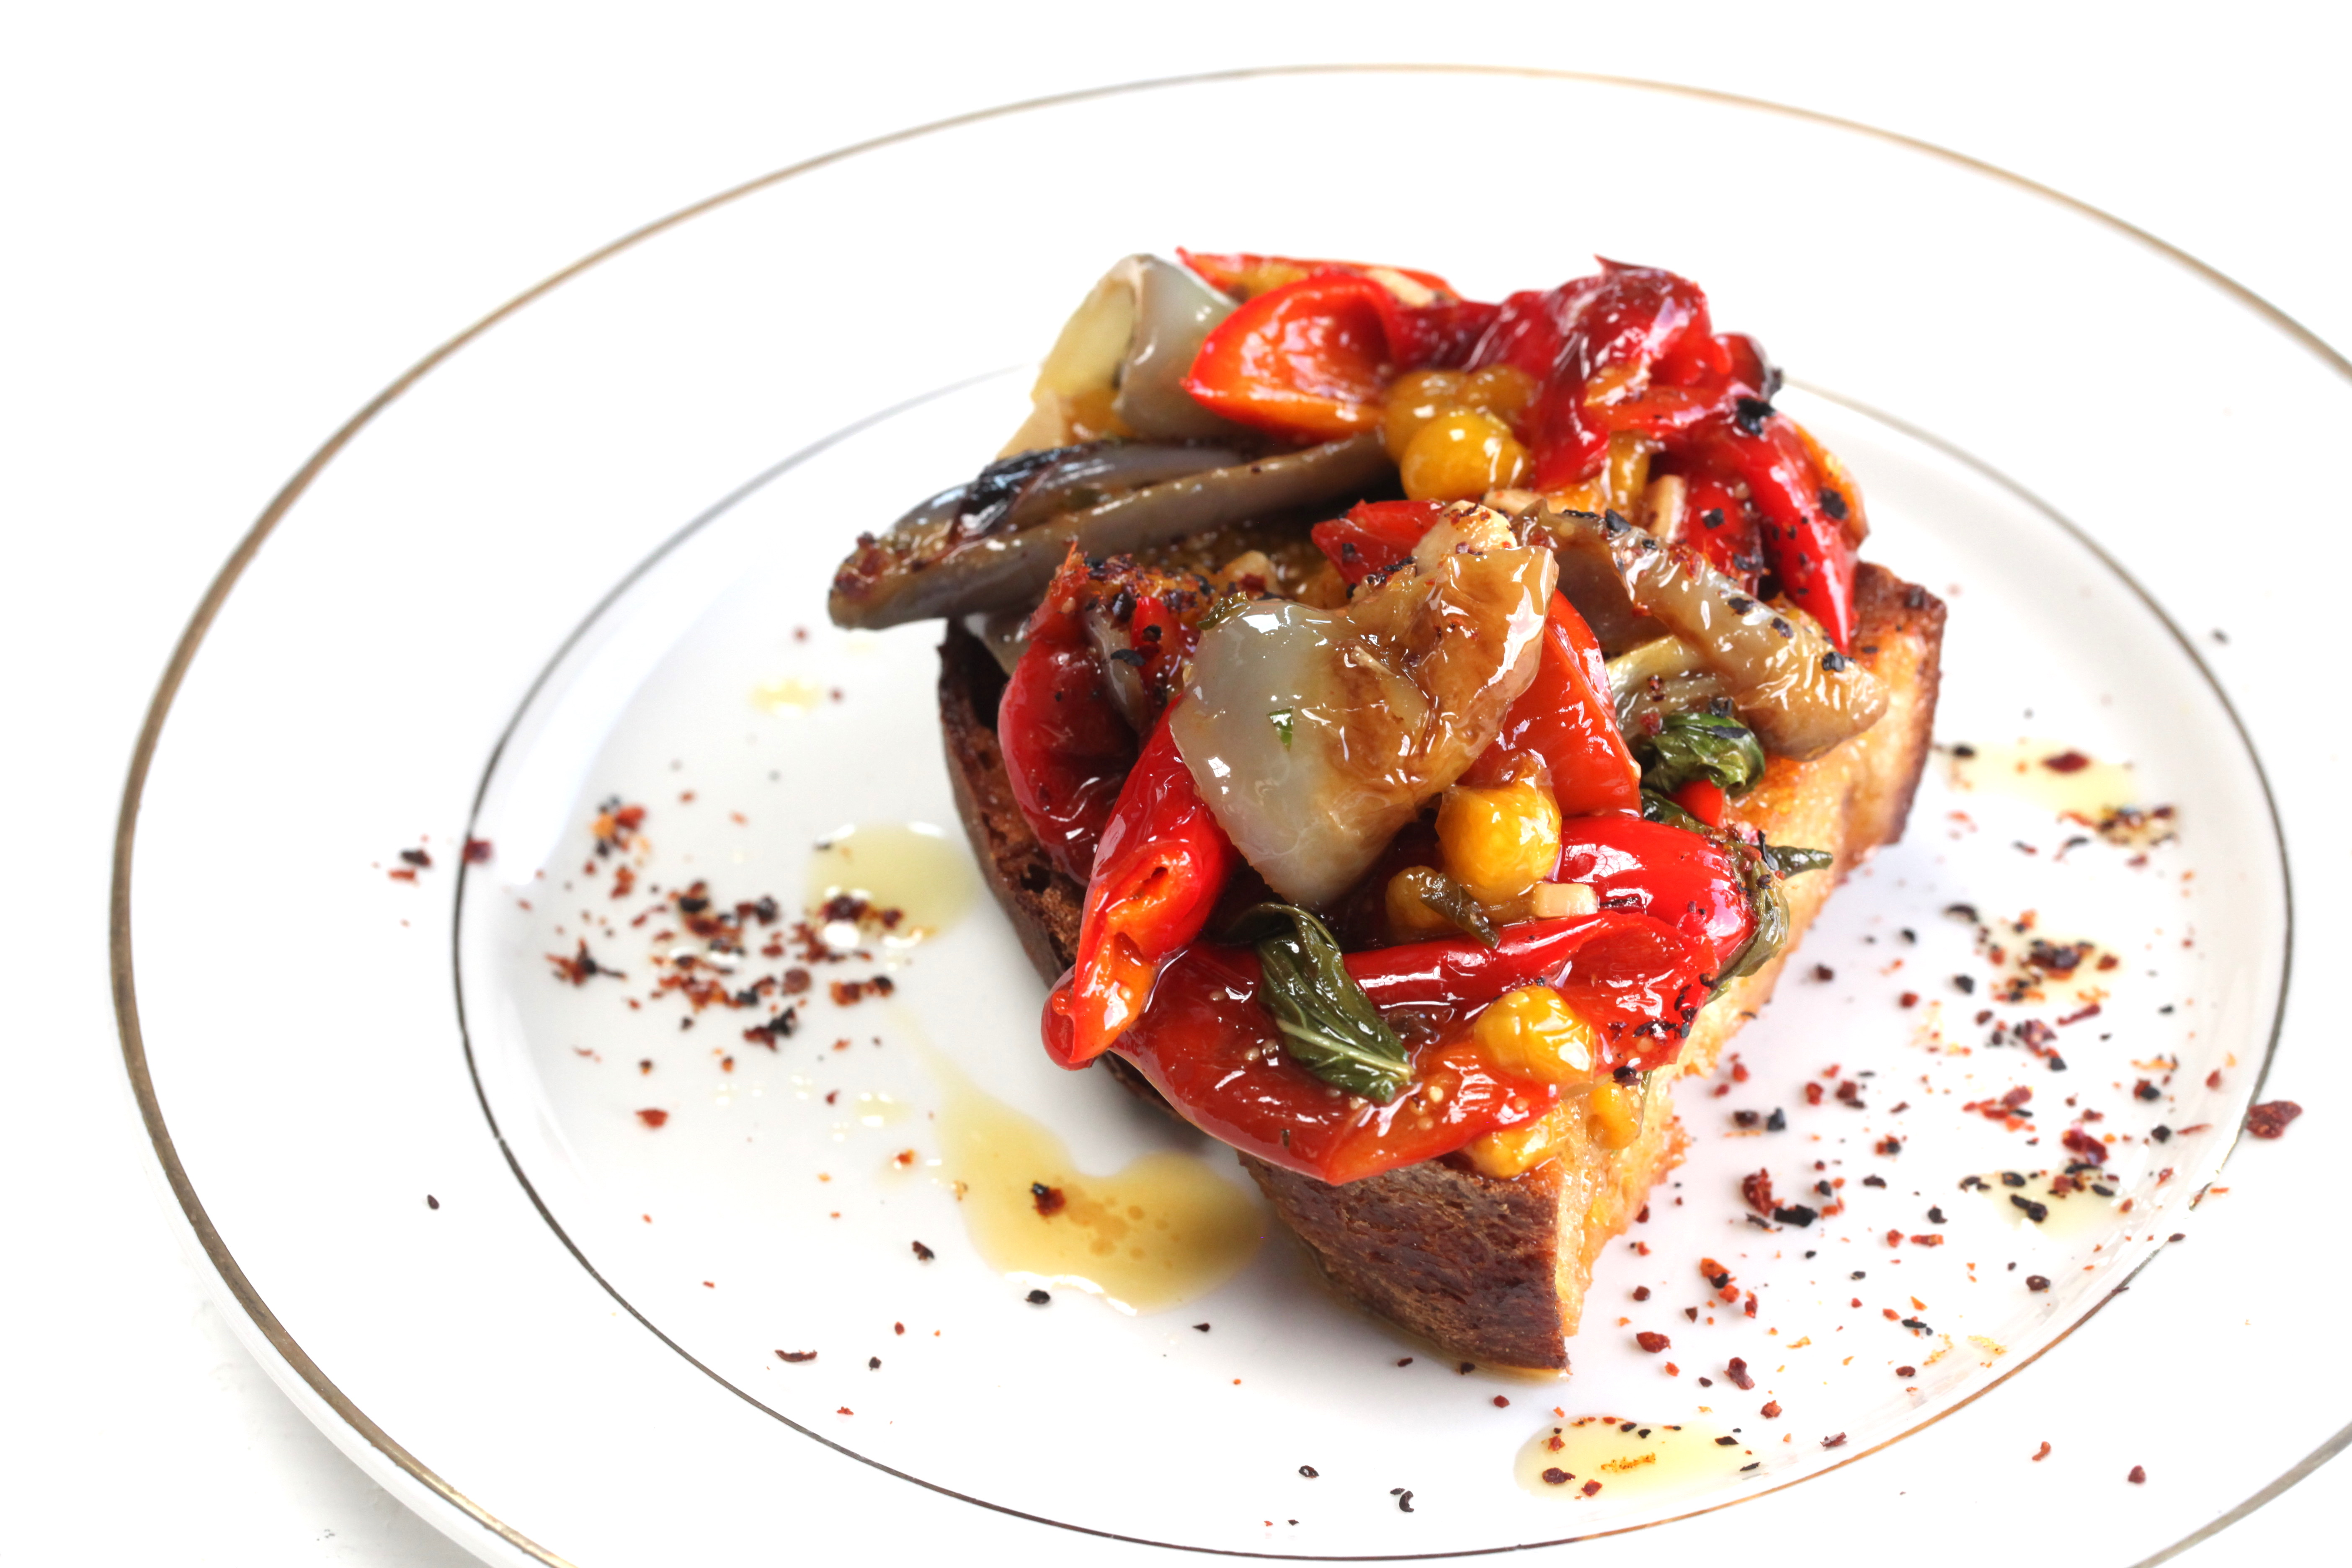 1539805241713-1538596773606-pepper-ground-cherry-toast-recipe